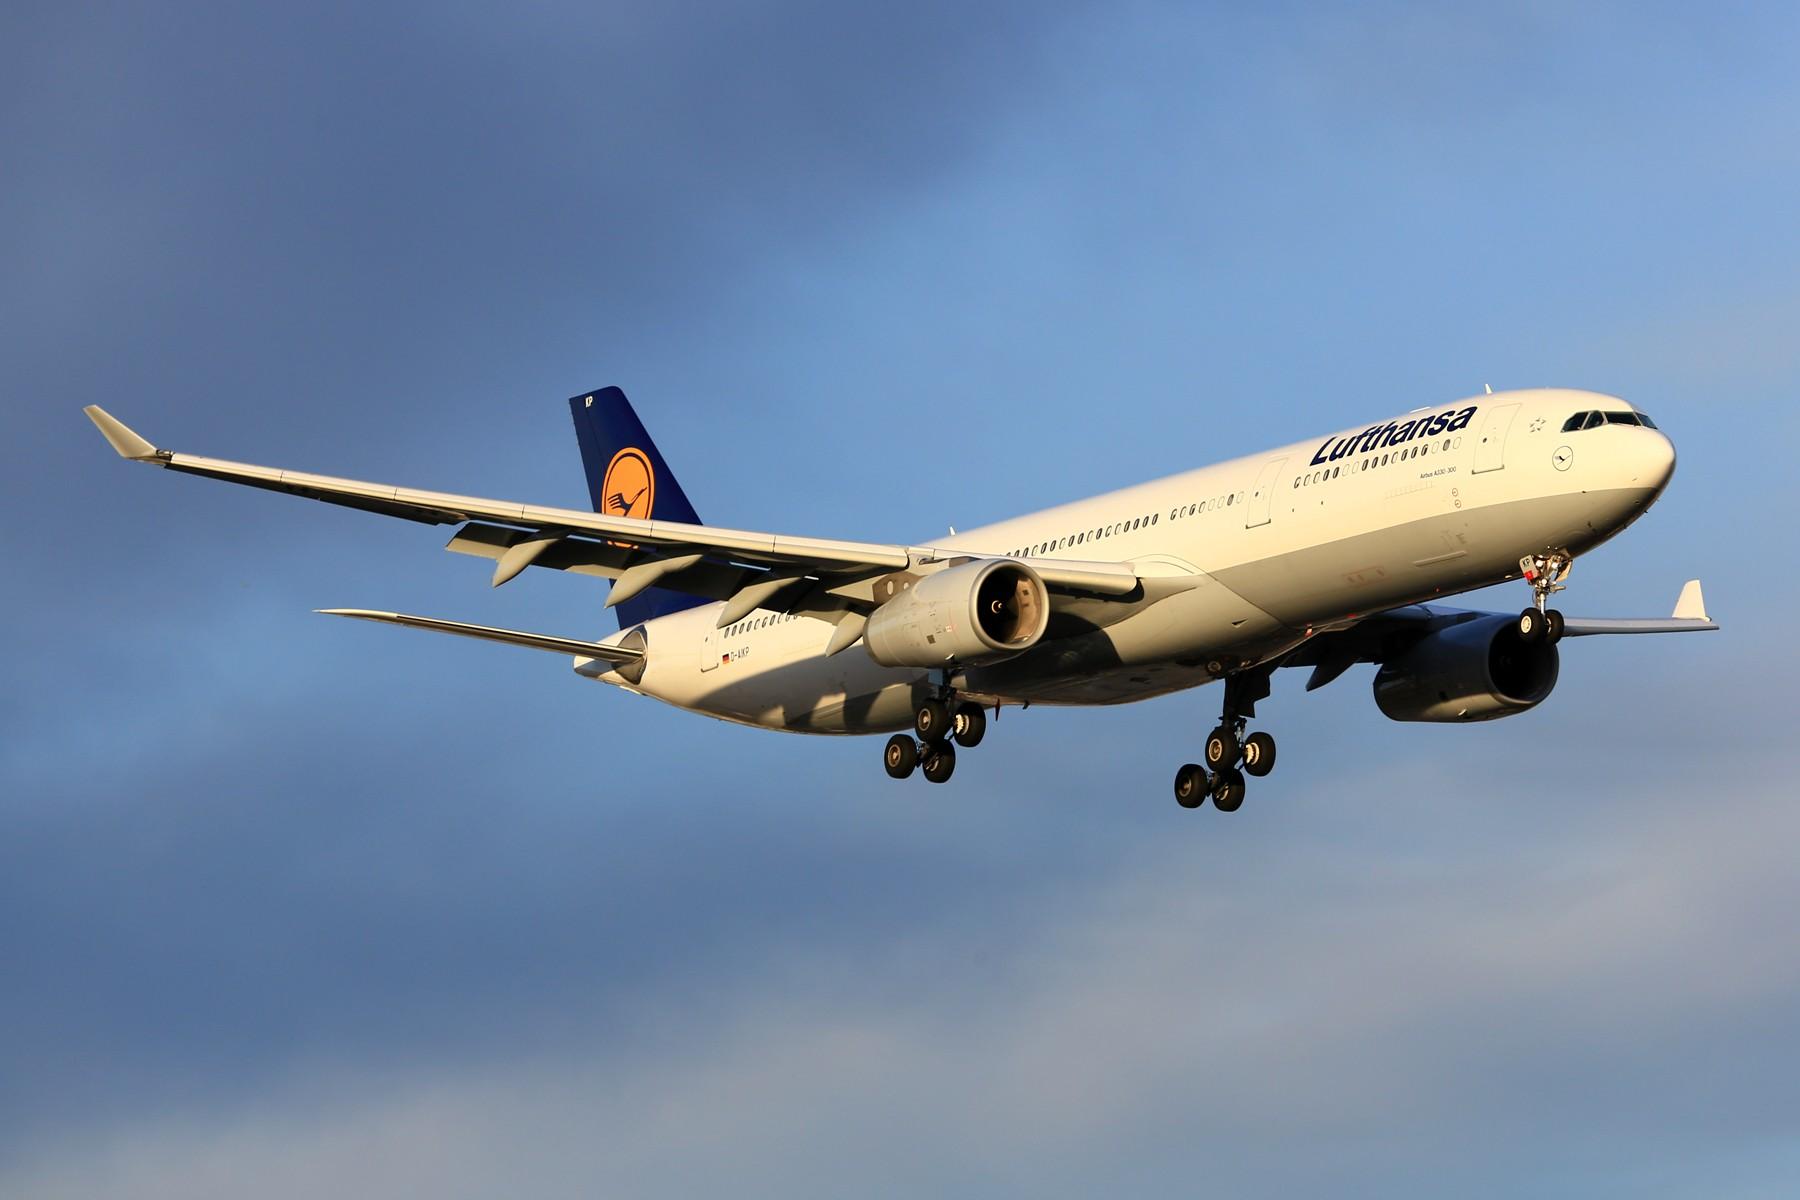 Re:[原创]tsniper及其背后的人注意了(请管理员保留置顶24小时) AIRBUS A330-300 D-AIKP 加拿大蒙特利尔特鲁多机场